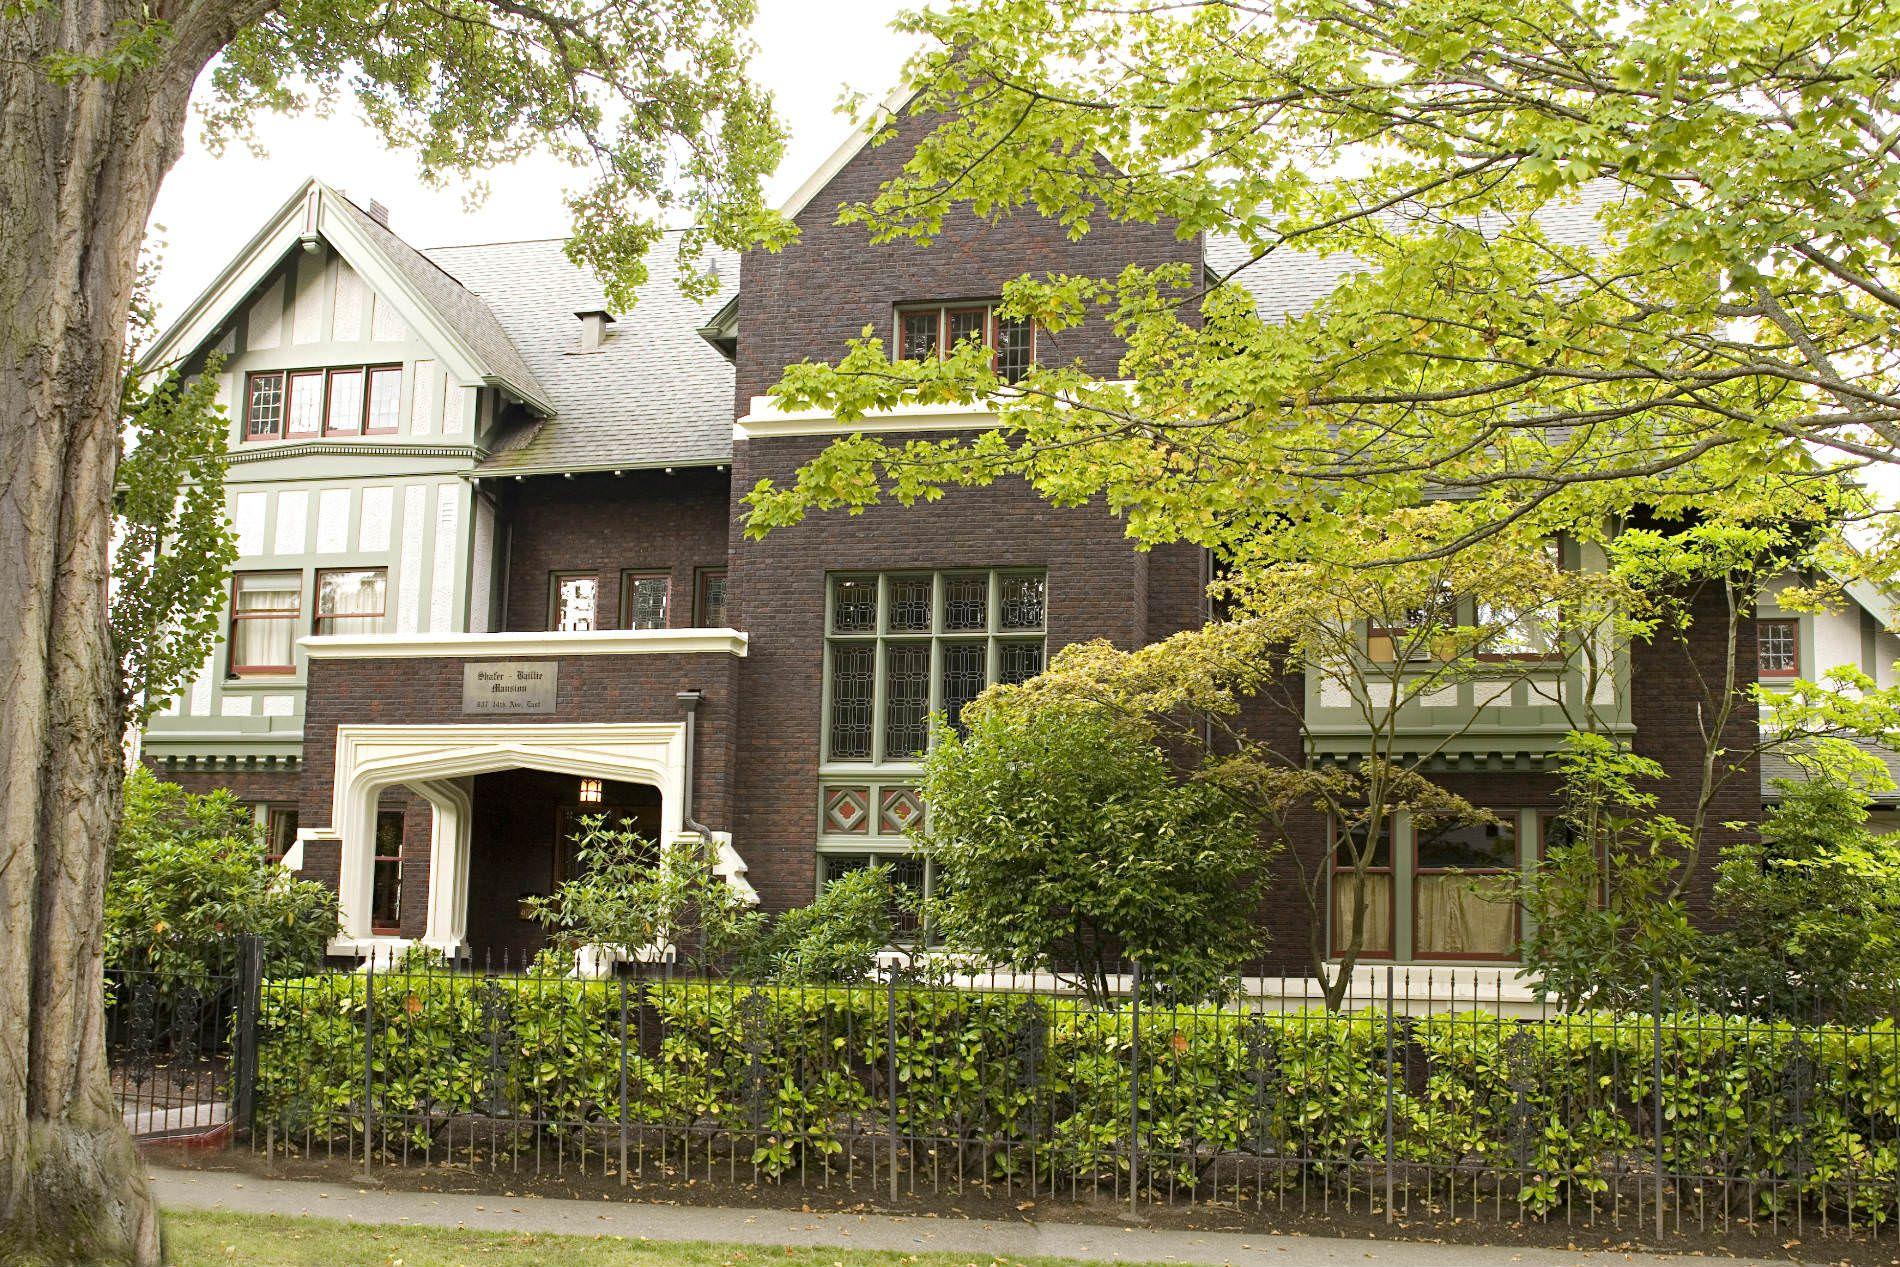 Seattle, Washington The Shafer Baillie Mansion